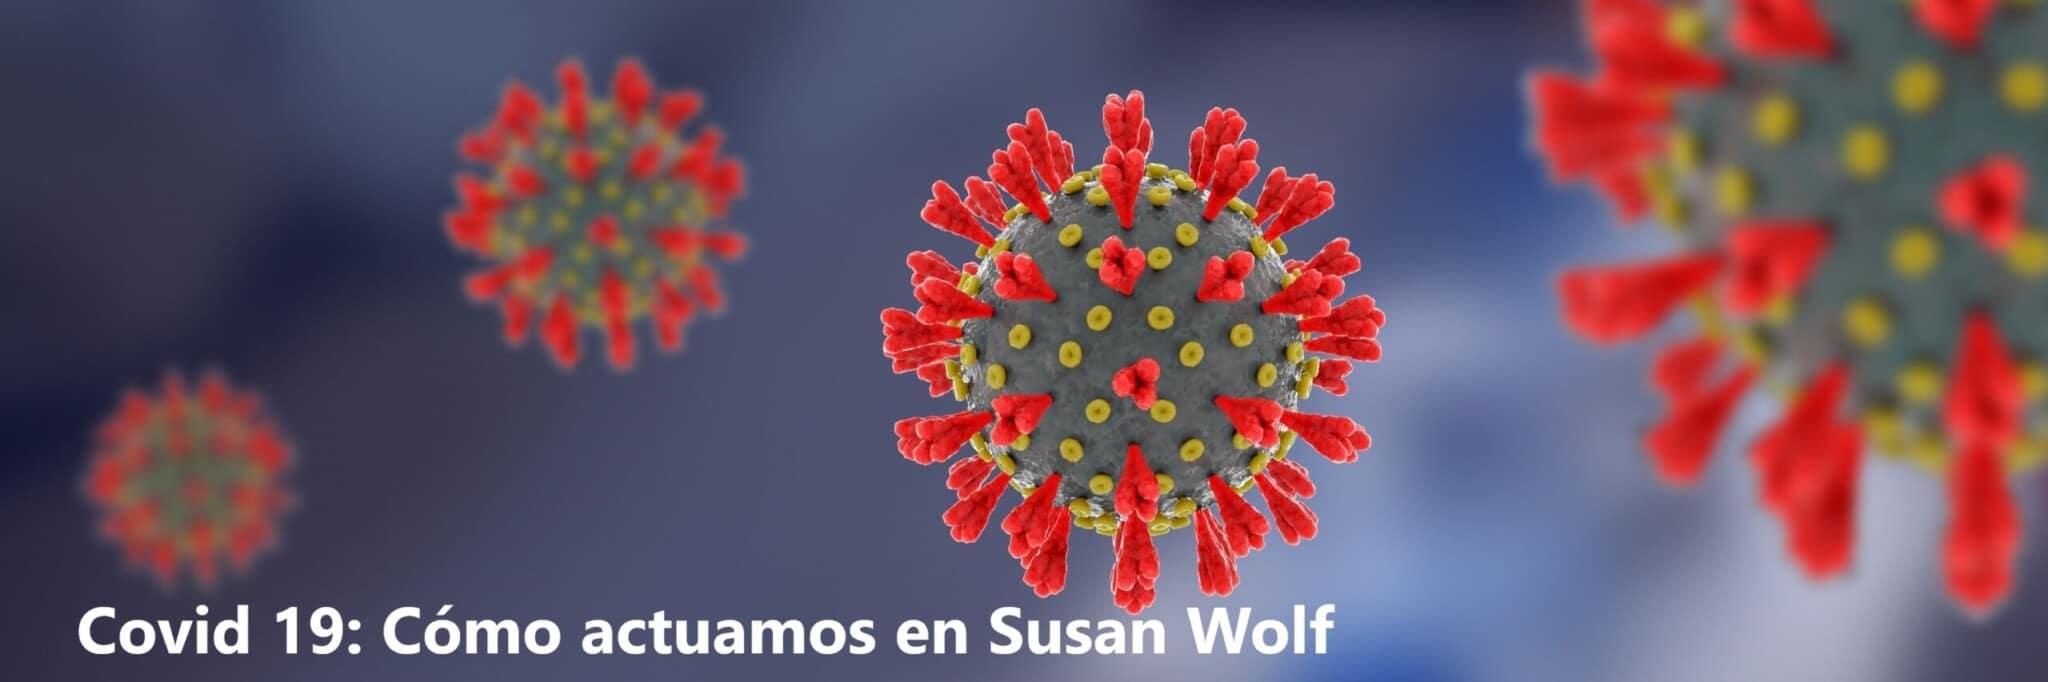 Covid 19 en Susan Wolf